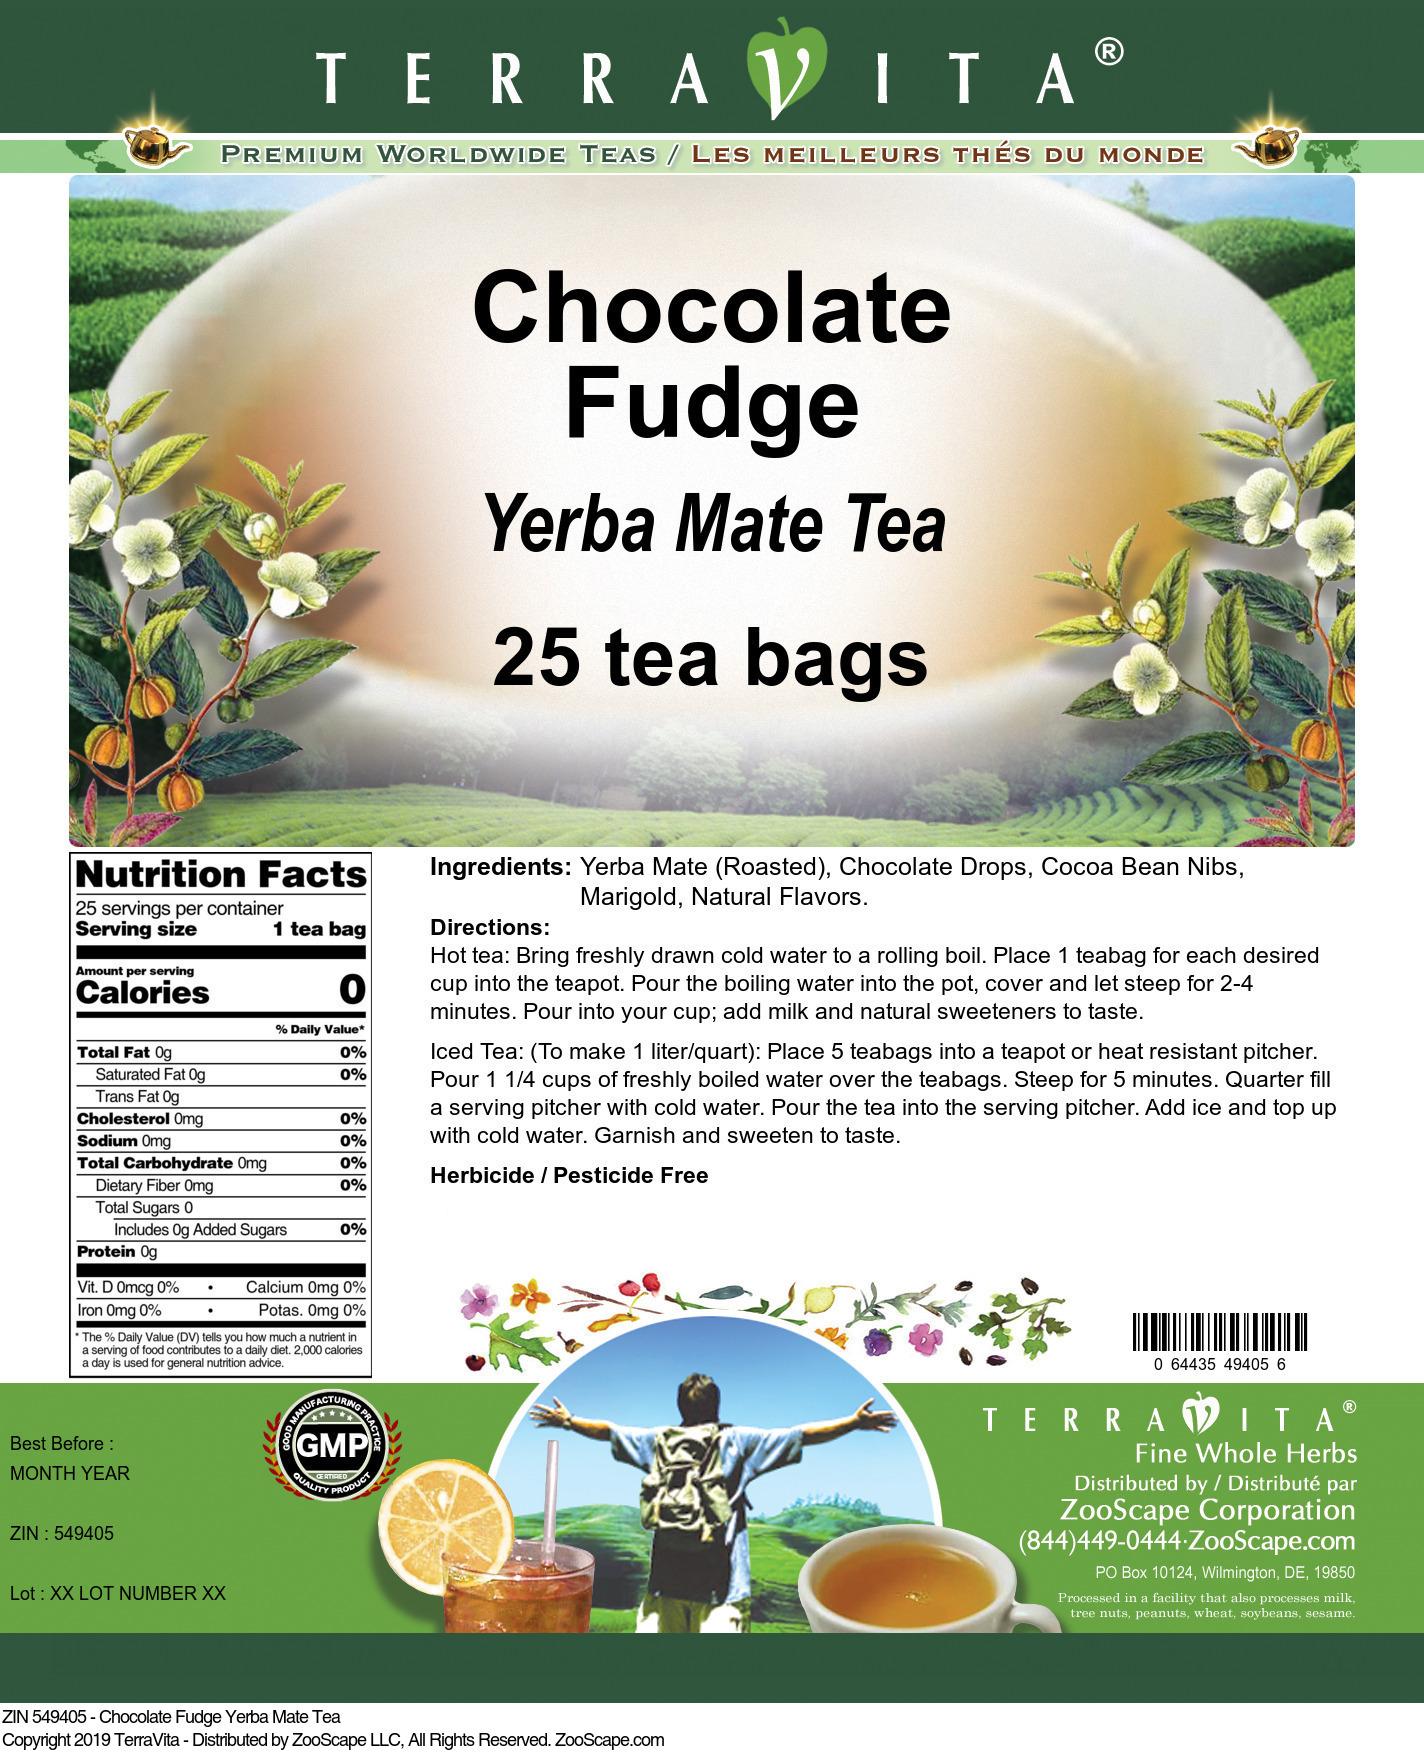 Chocolate Fudge Yerba Mate Tea